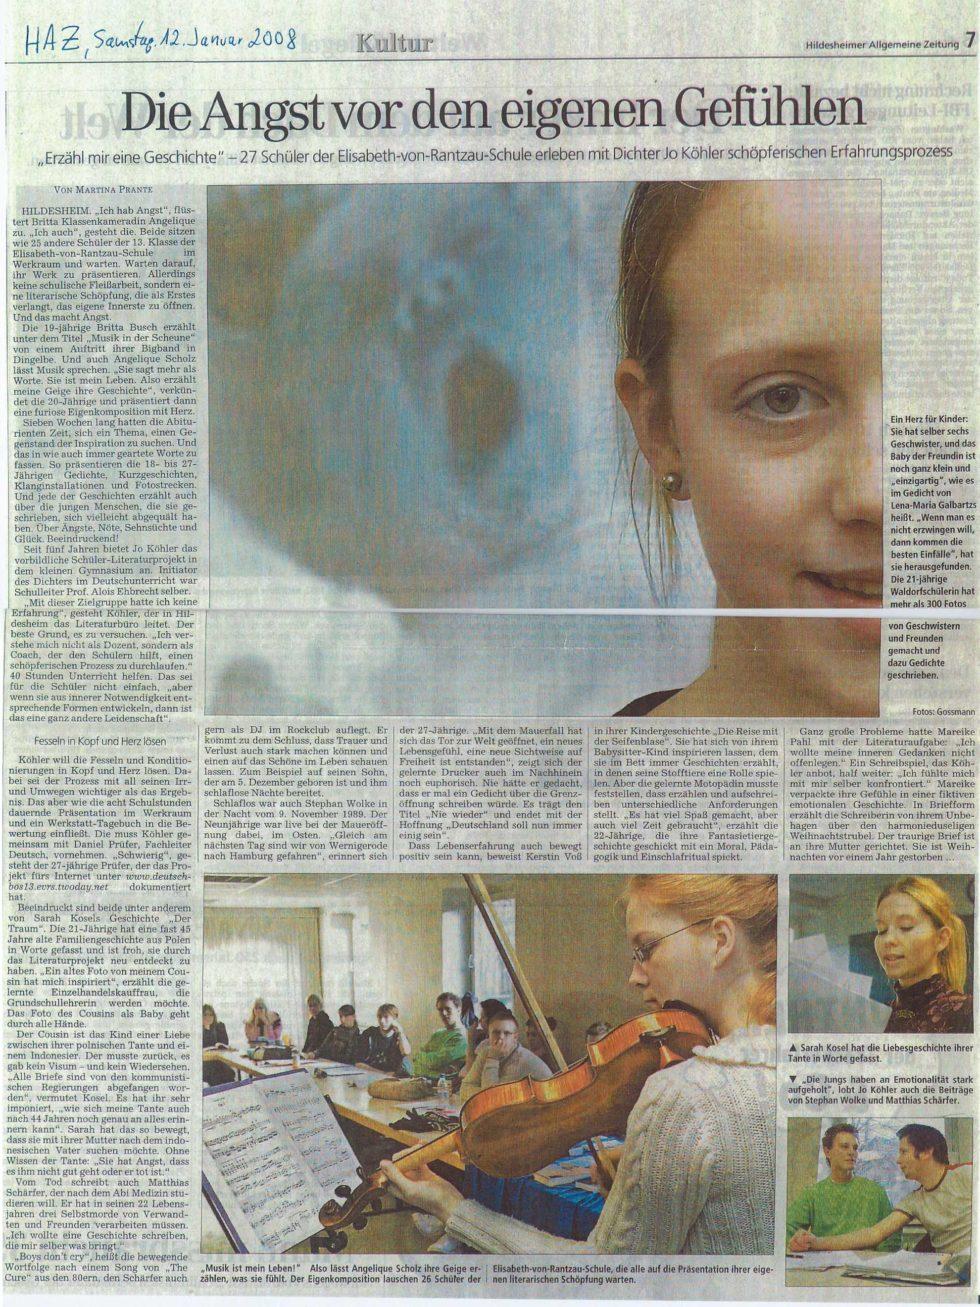 HAZ_Schulprojekte2008_12.01.08